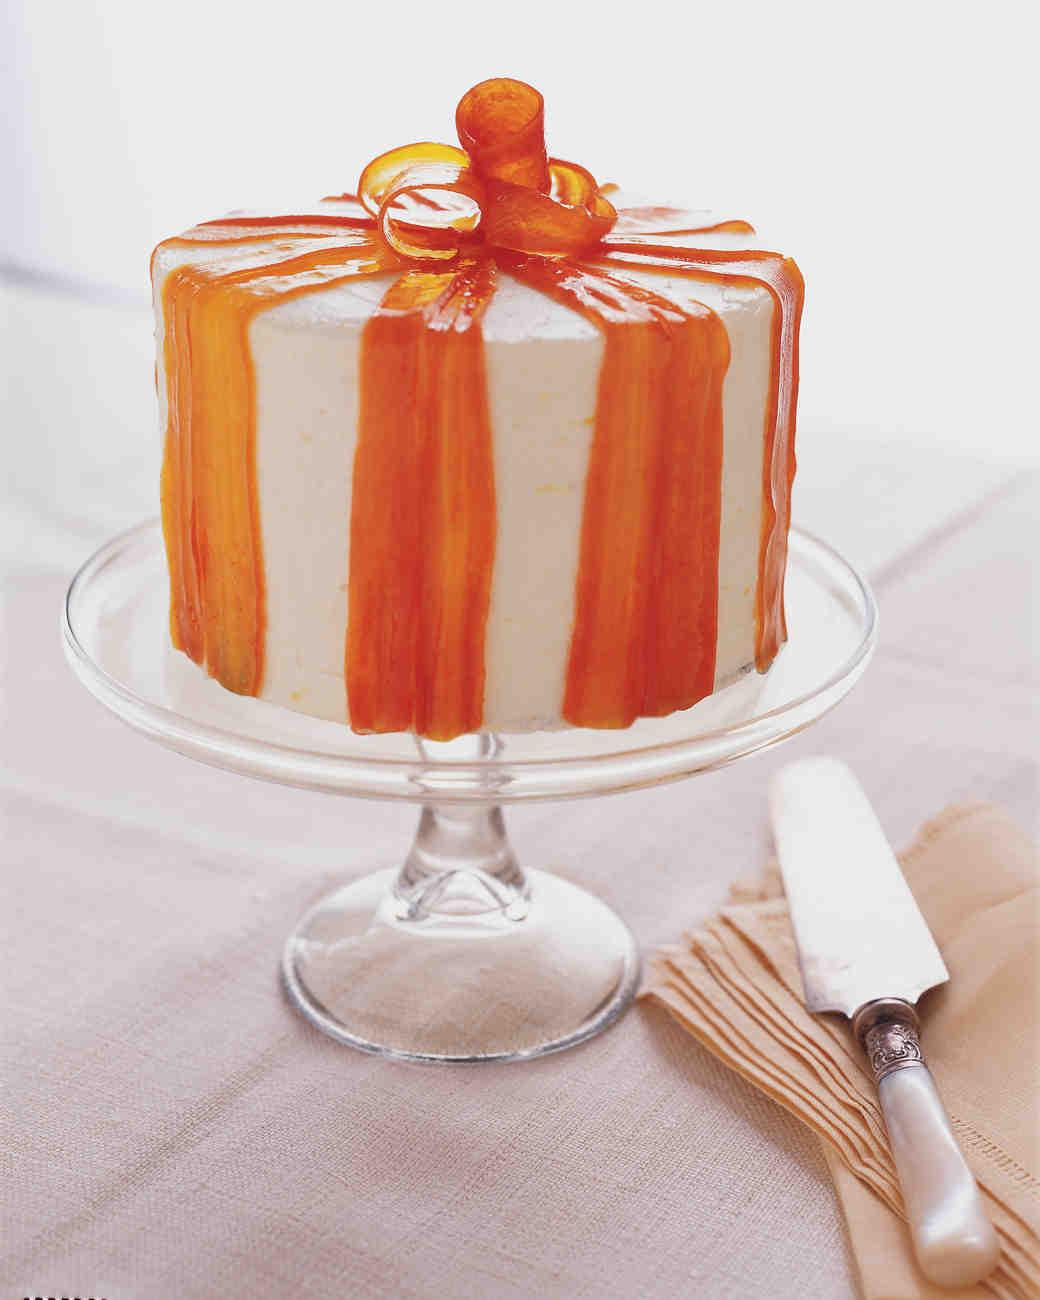 cakes_00114_t.jpg